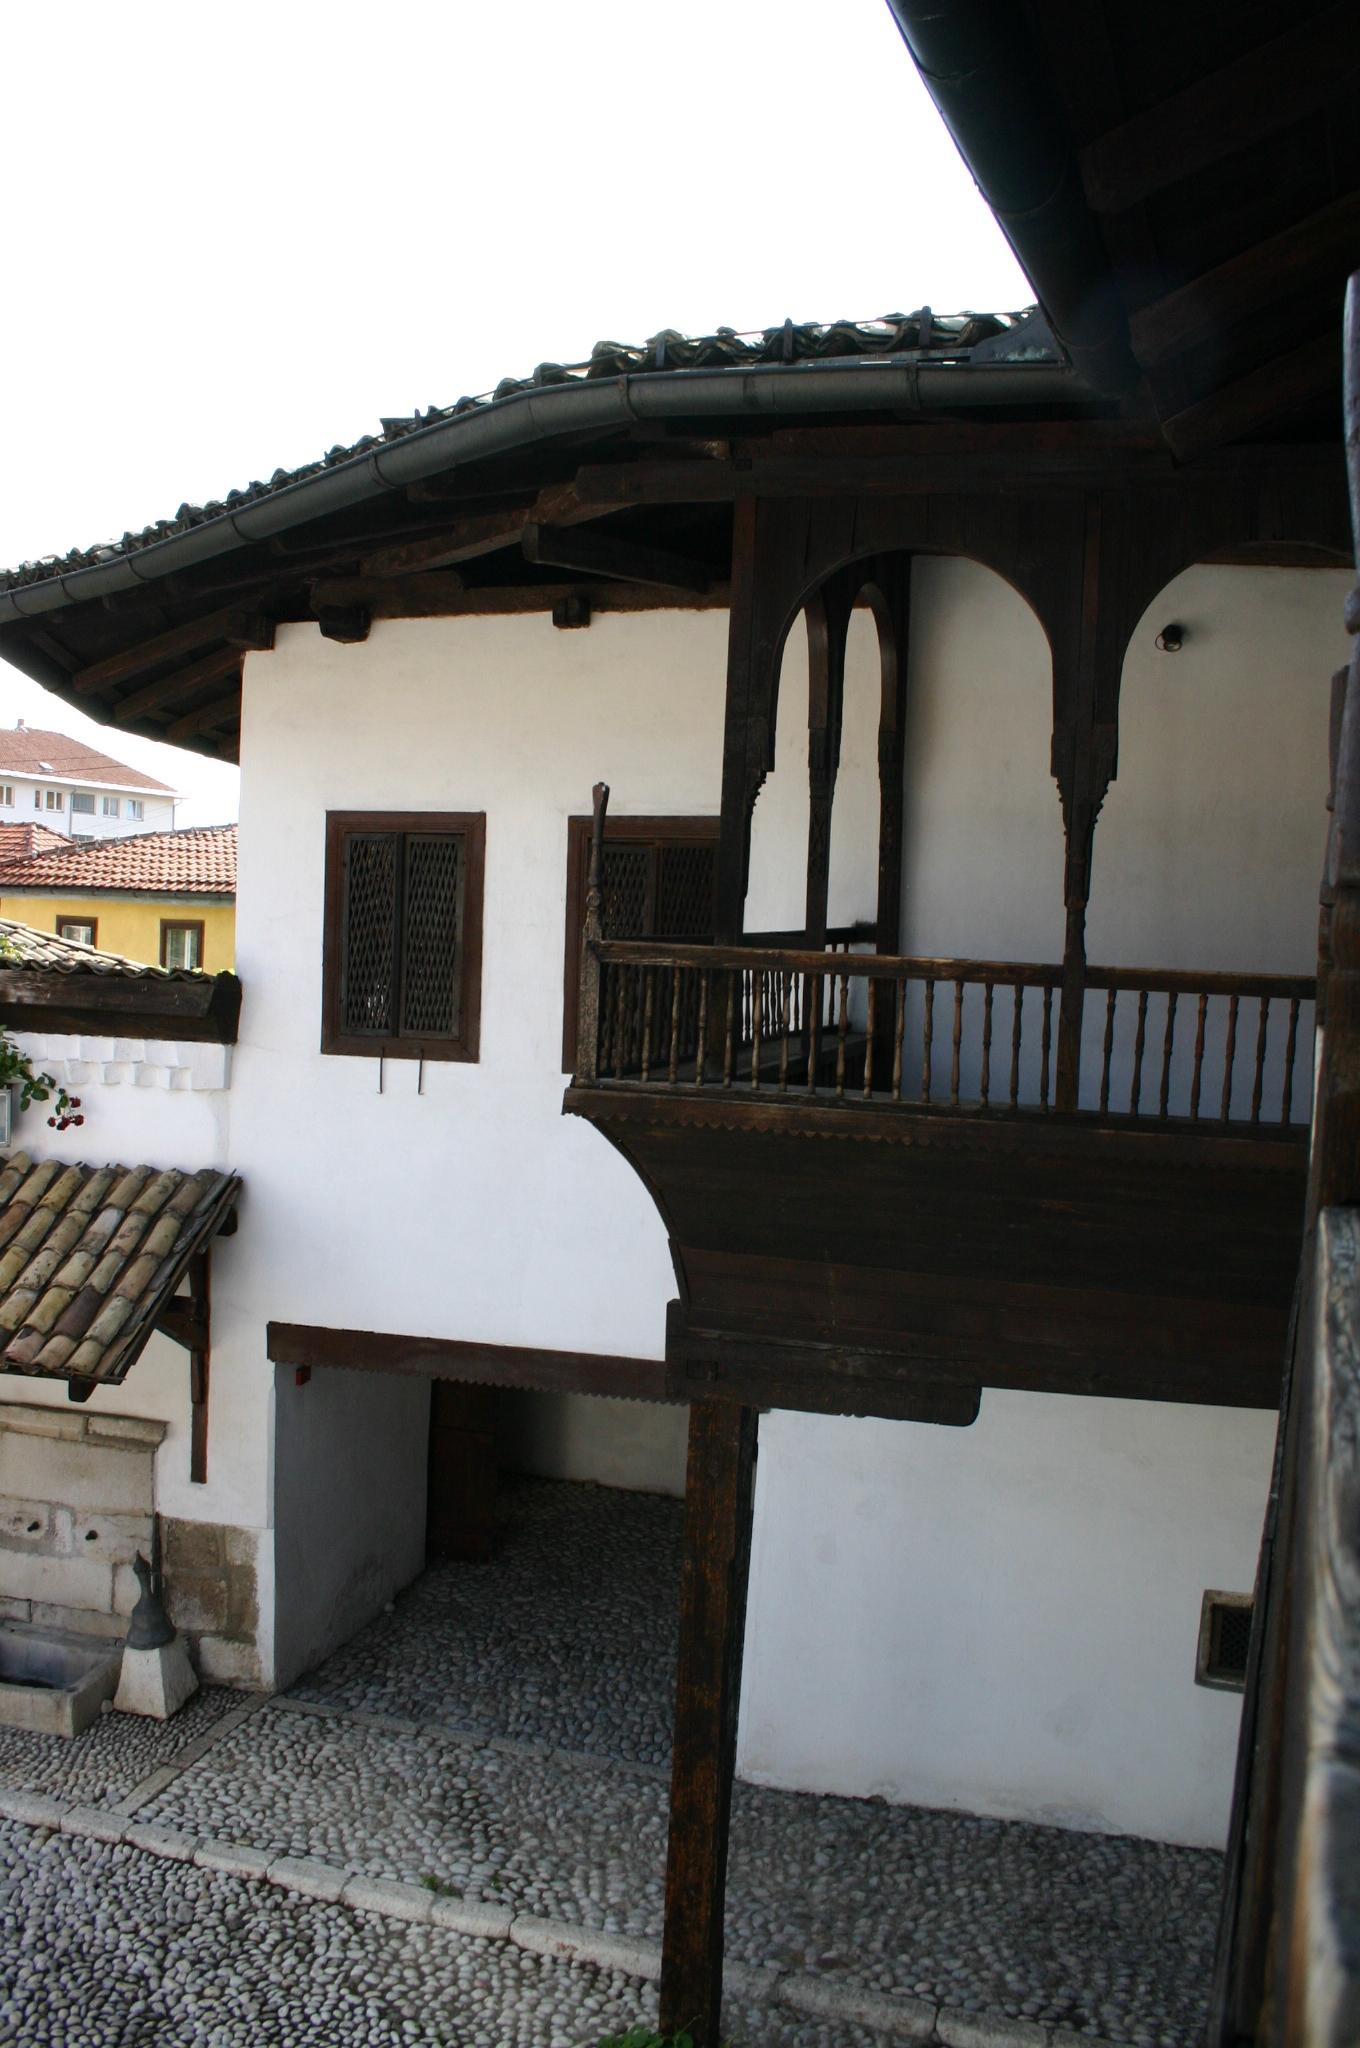 Color art fojnica - Ottoman Art In Bosnia And Herzegovina Edit